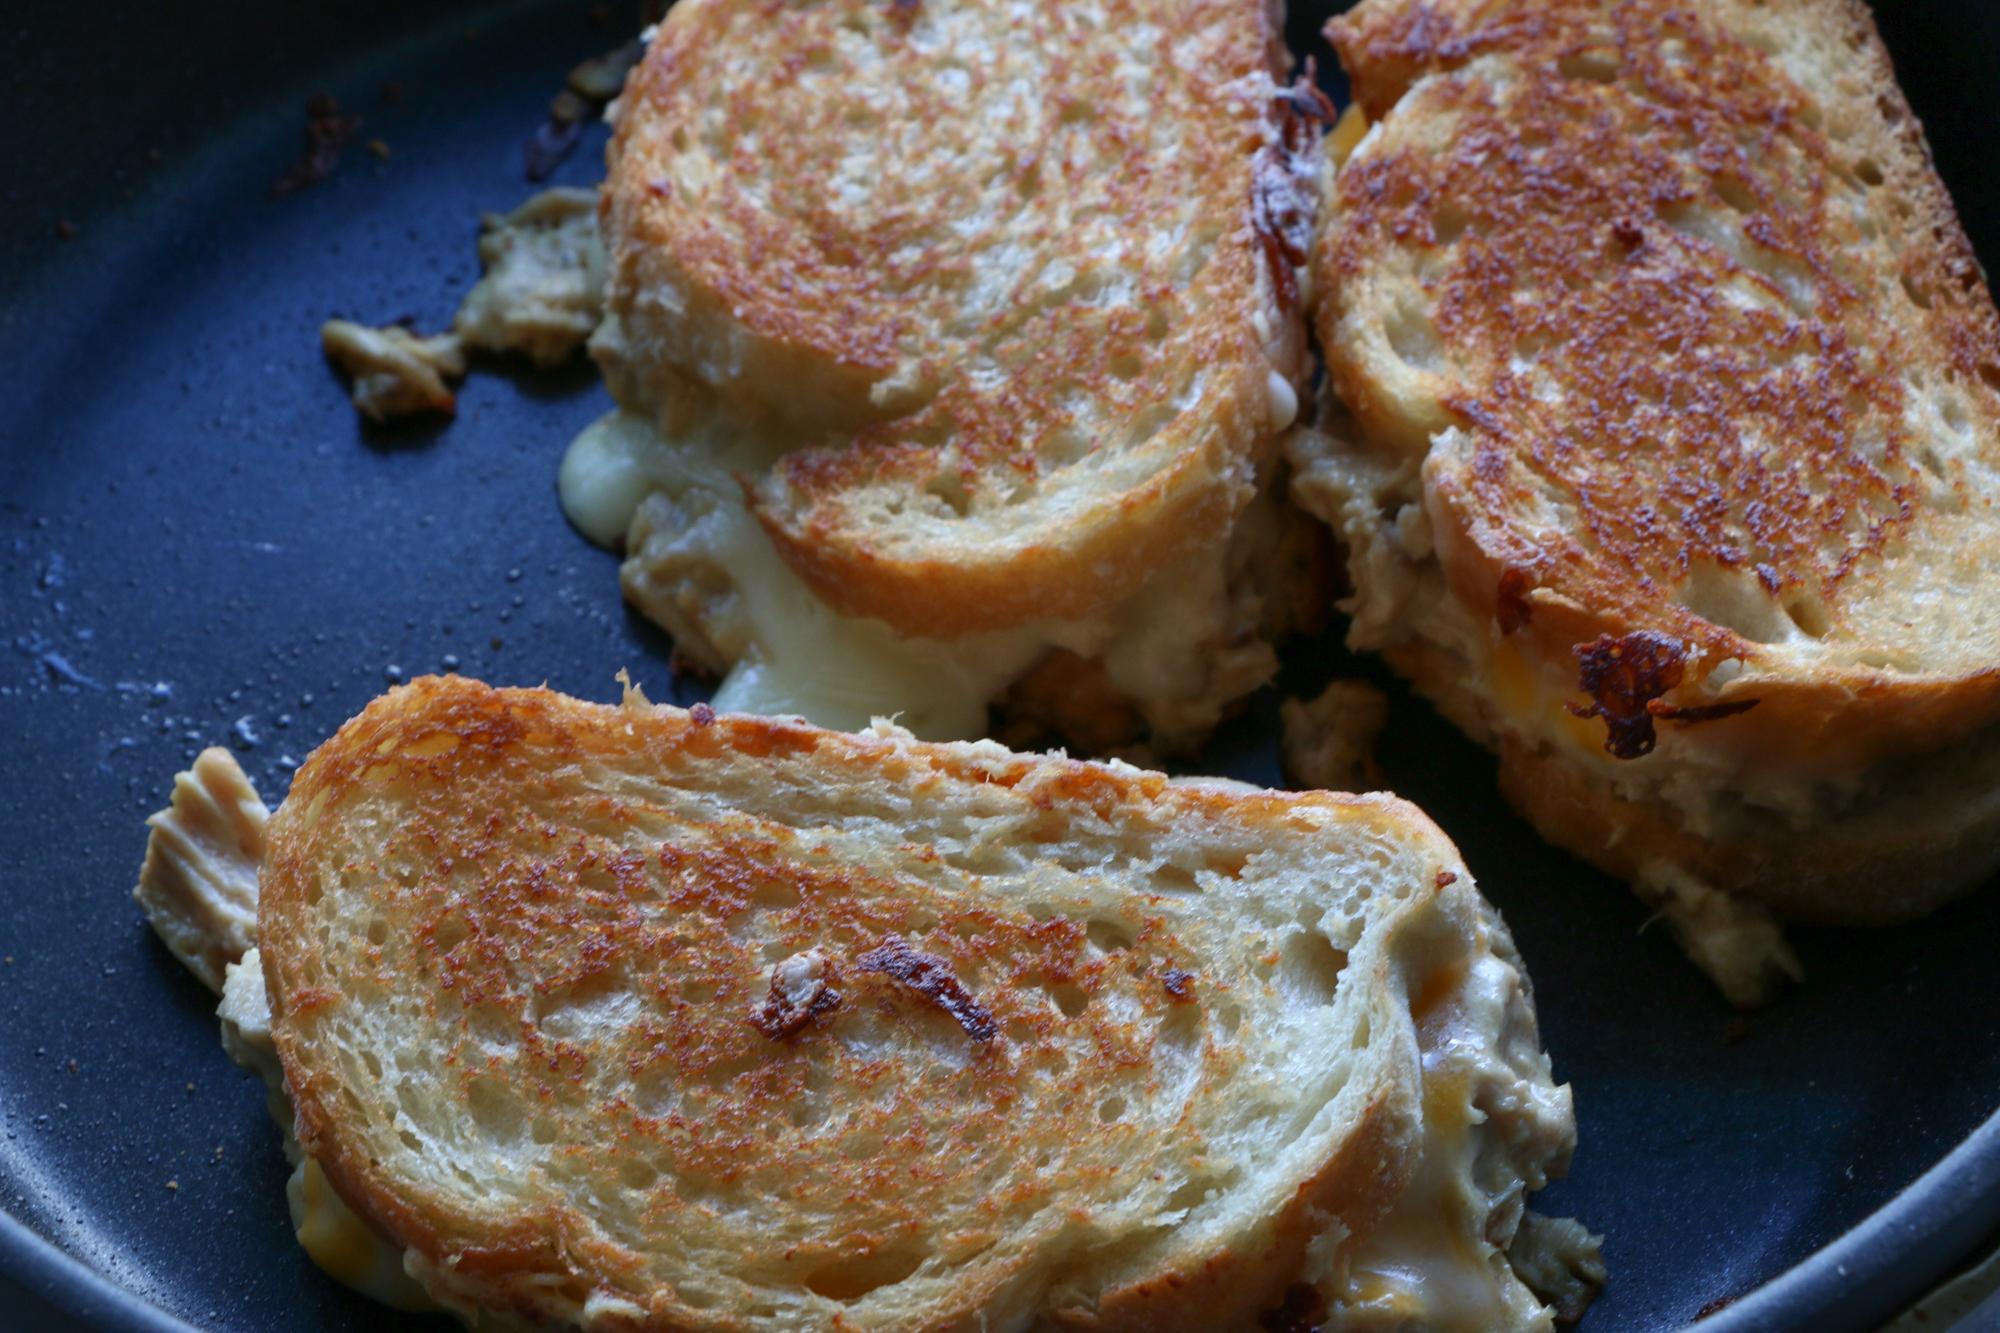 Simple Lunch Idea, Tuna melt sandwiches